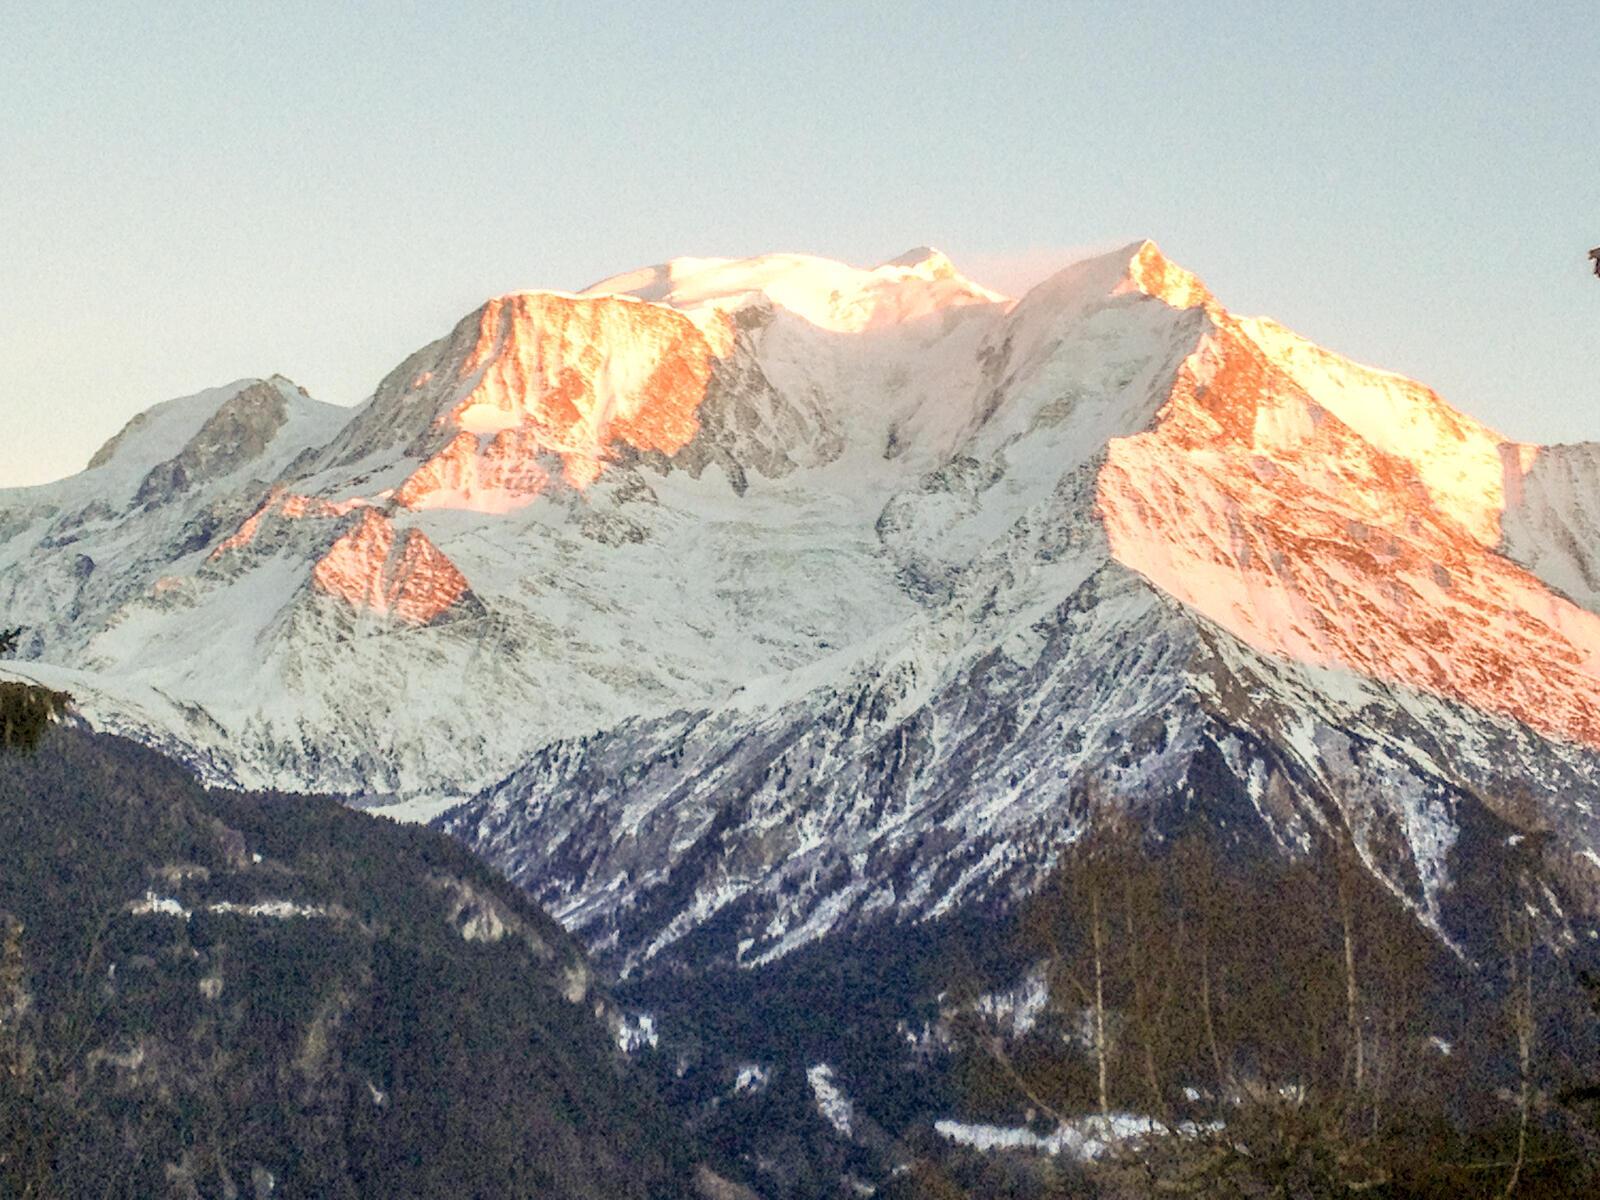 Вершина Монблана расположена на территории французского города Сен-Жерве.